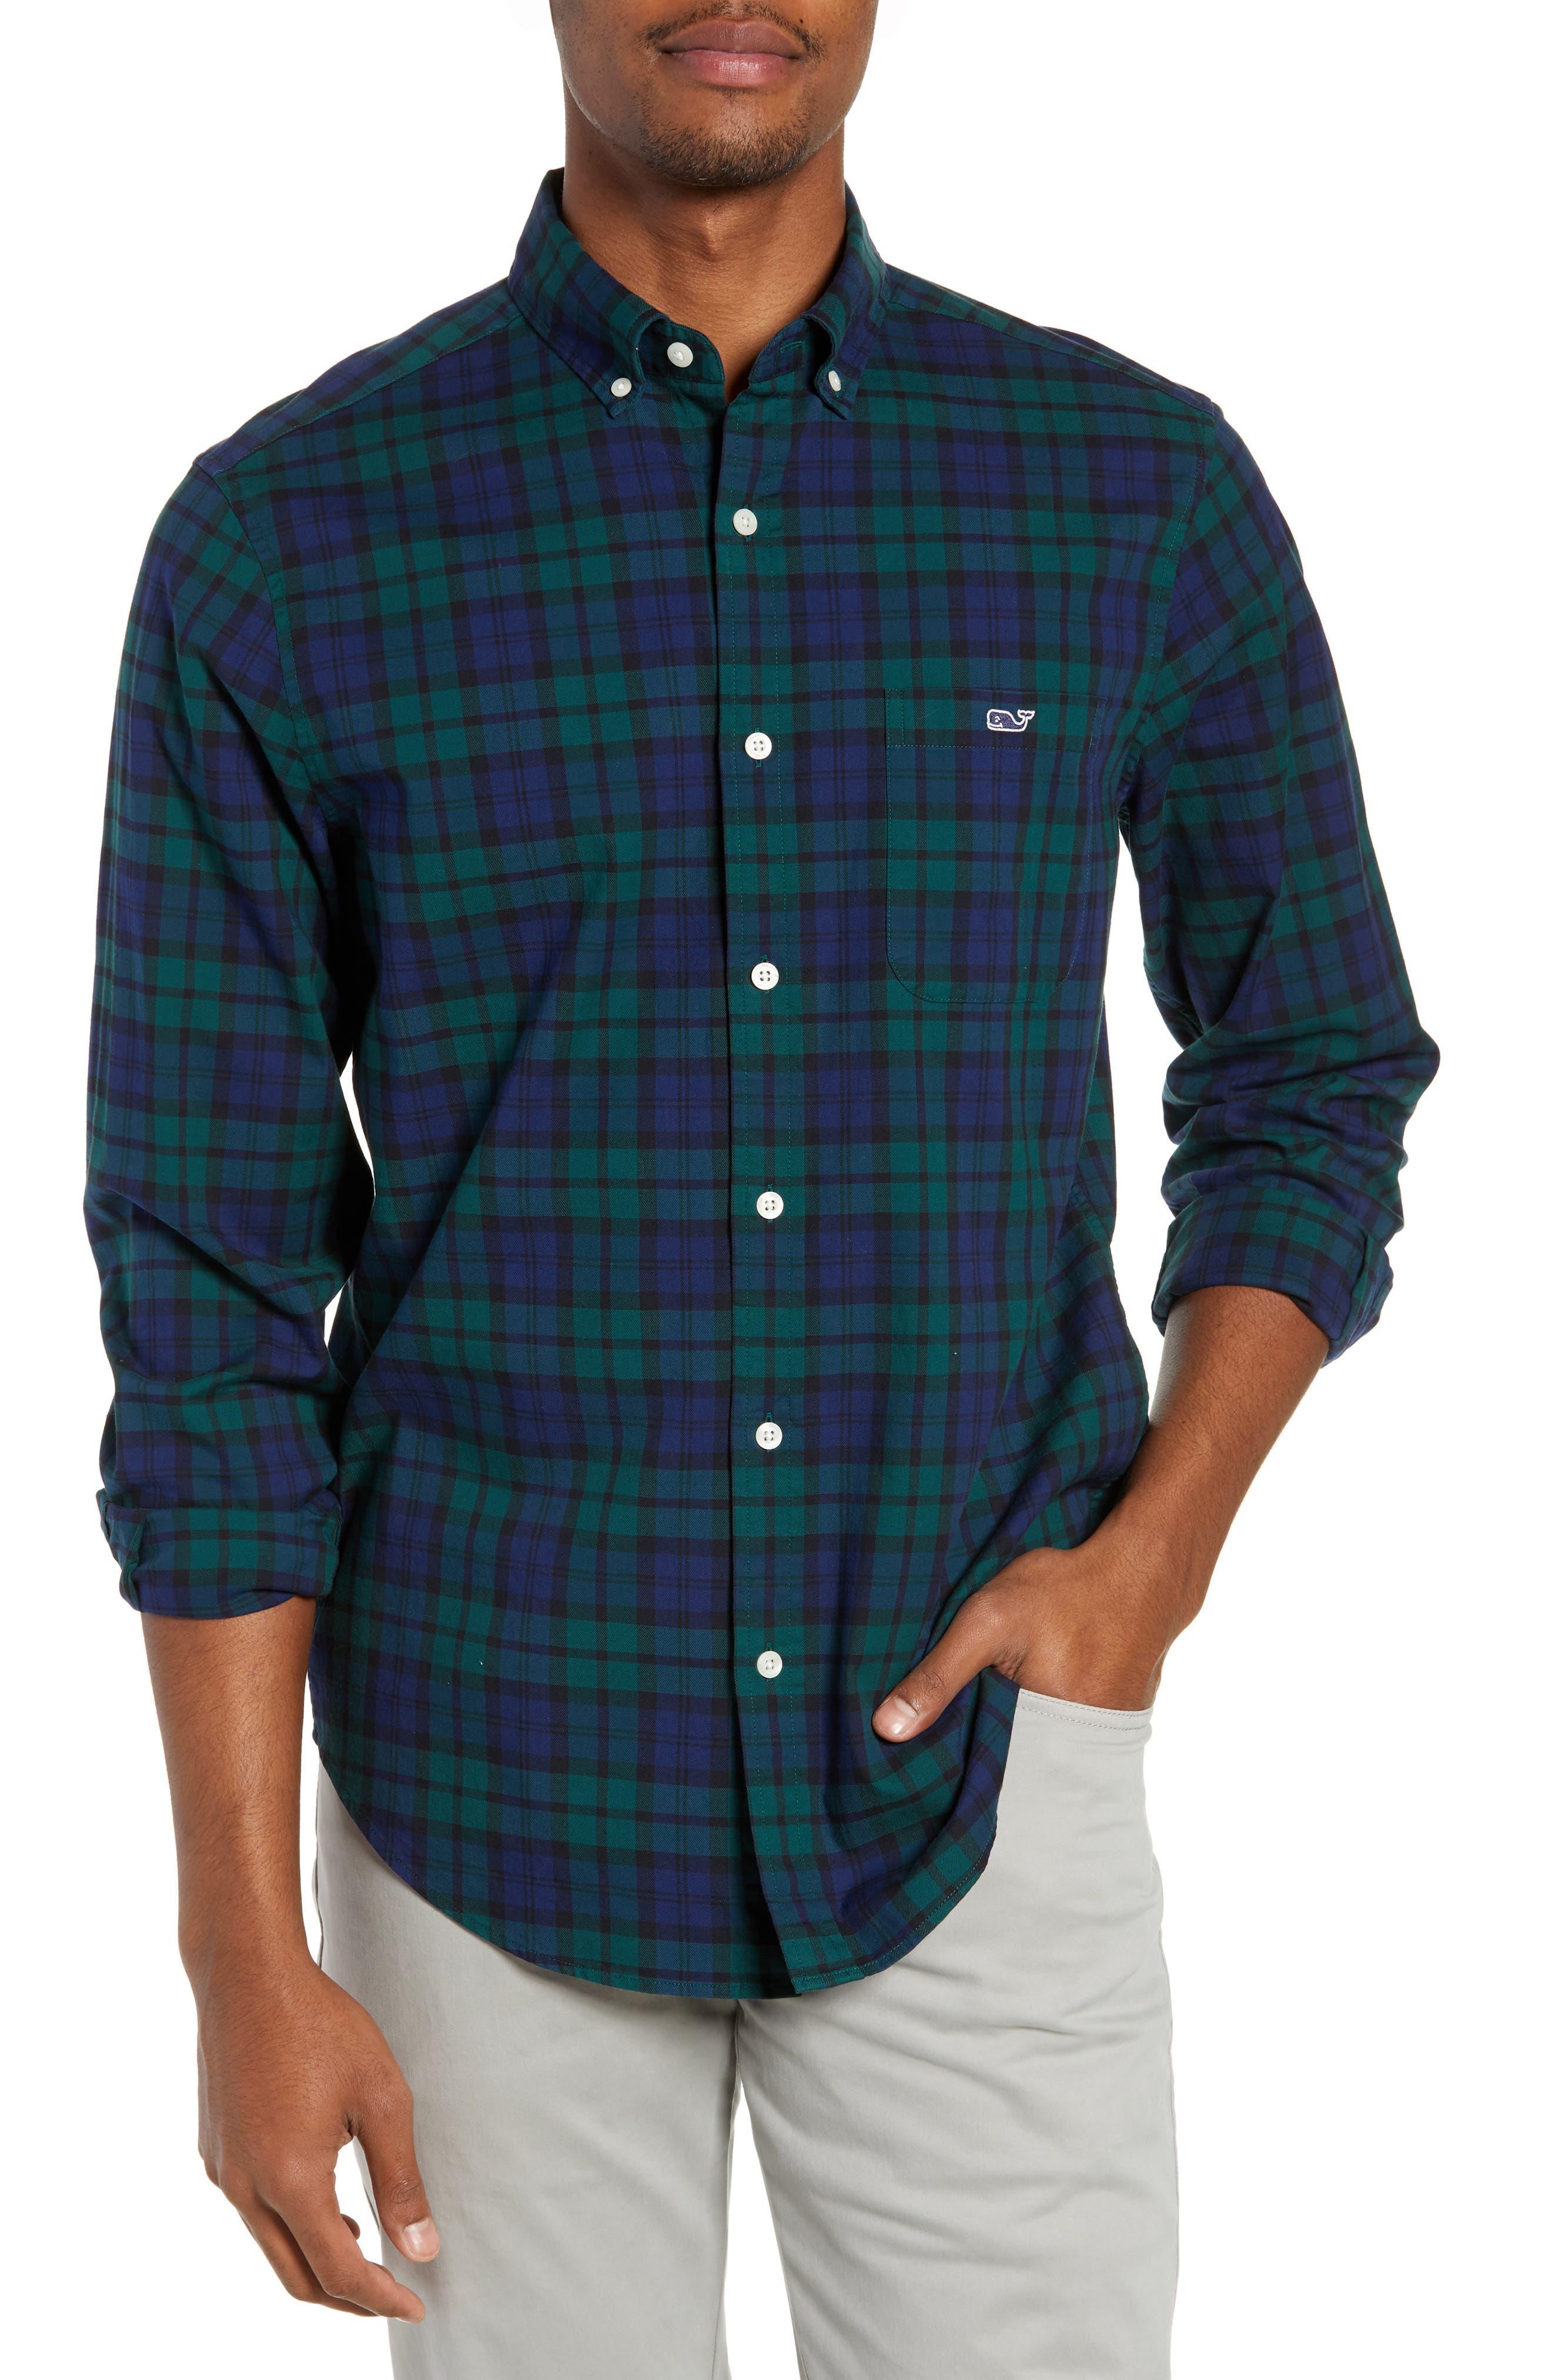 VINEYARD VINES Palmer Hill Tucker Plaid Classic Fit Button-Down Shirt in Charleston Green